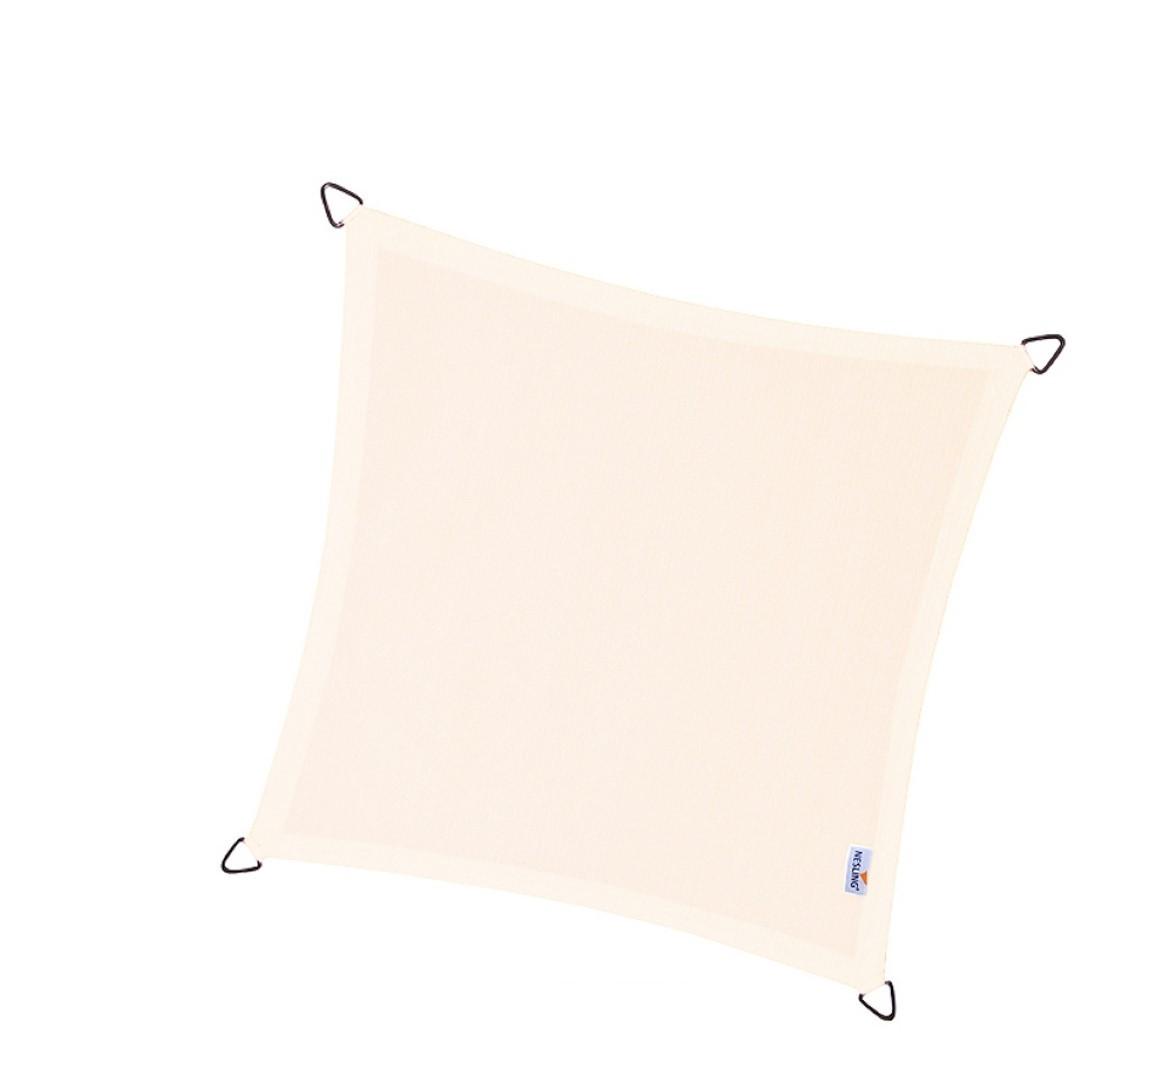 Vierkant 4,0 x 4,0 x 4,0 x 4,0m, Cream